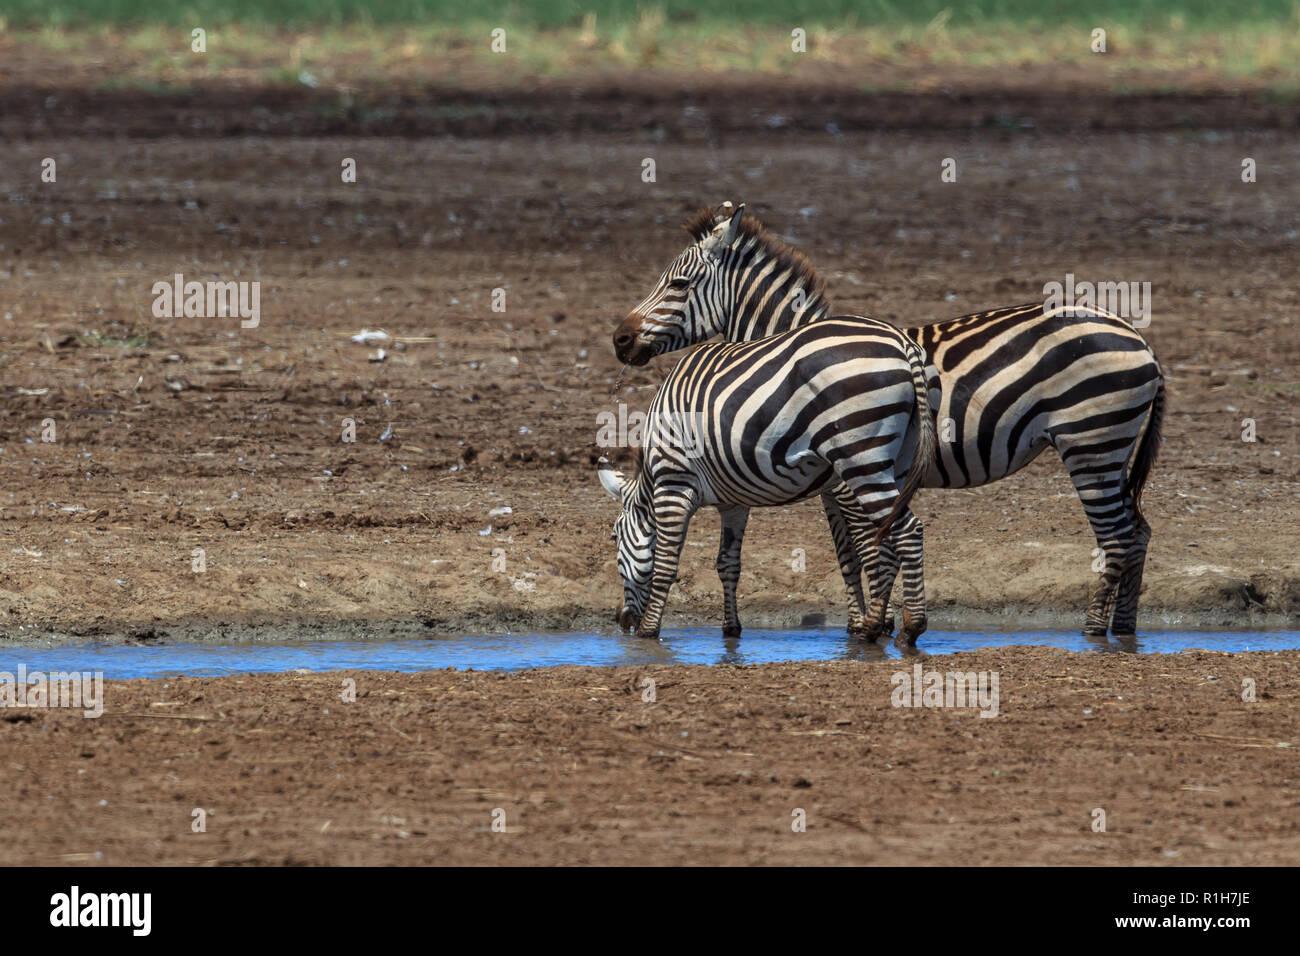 Common zebra in Lake Manyara, Tanzania - Stock Image